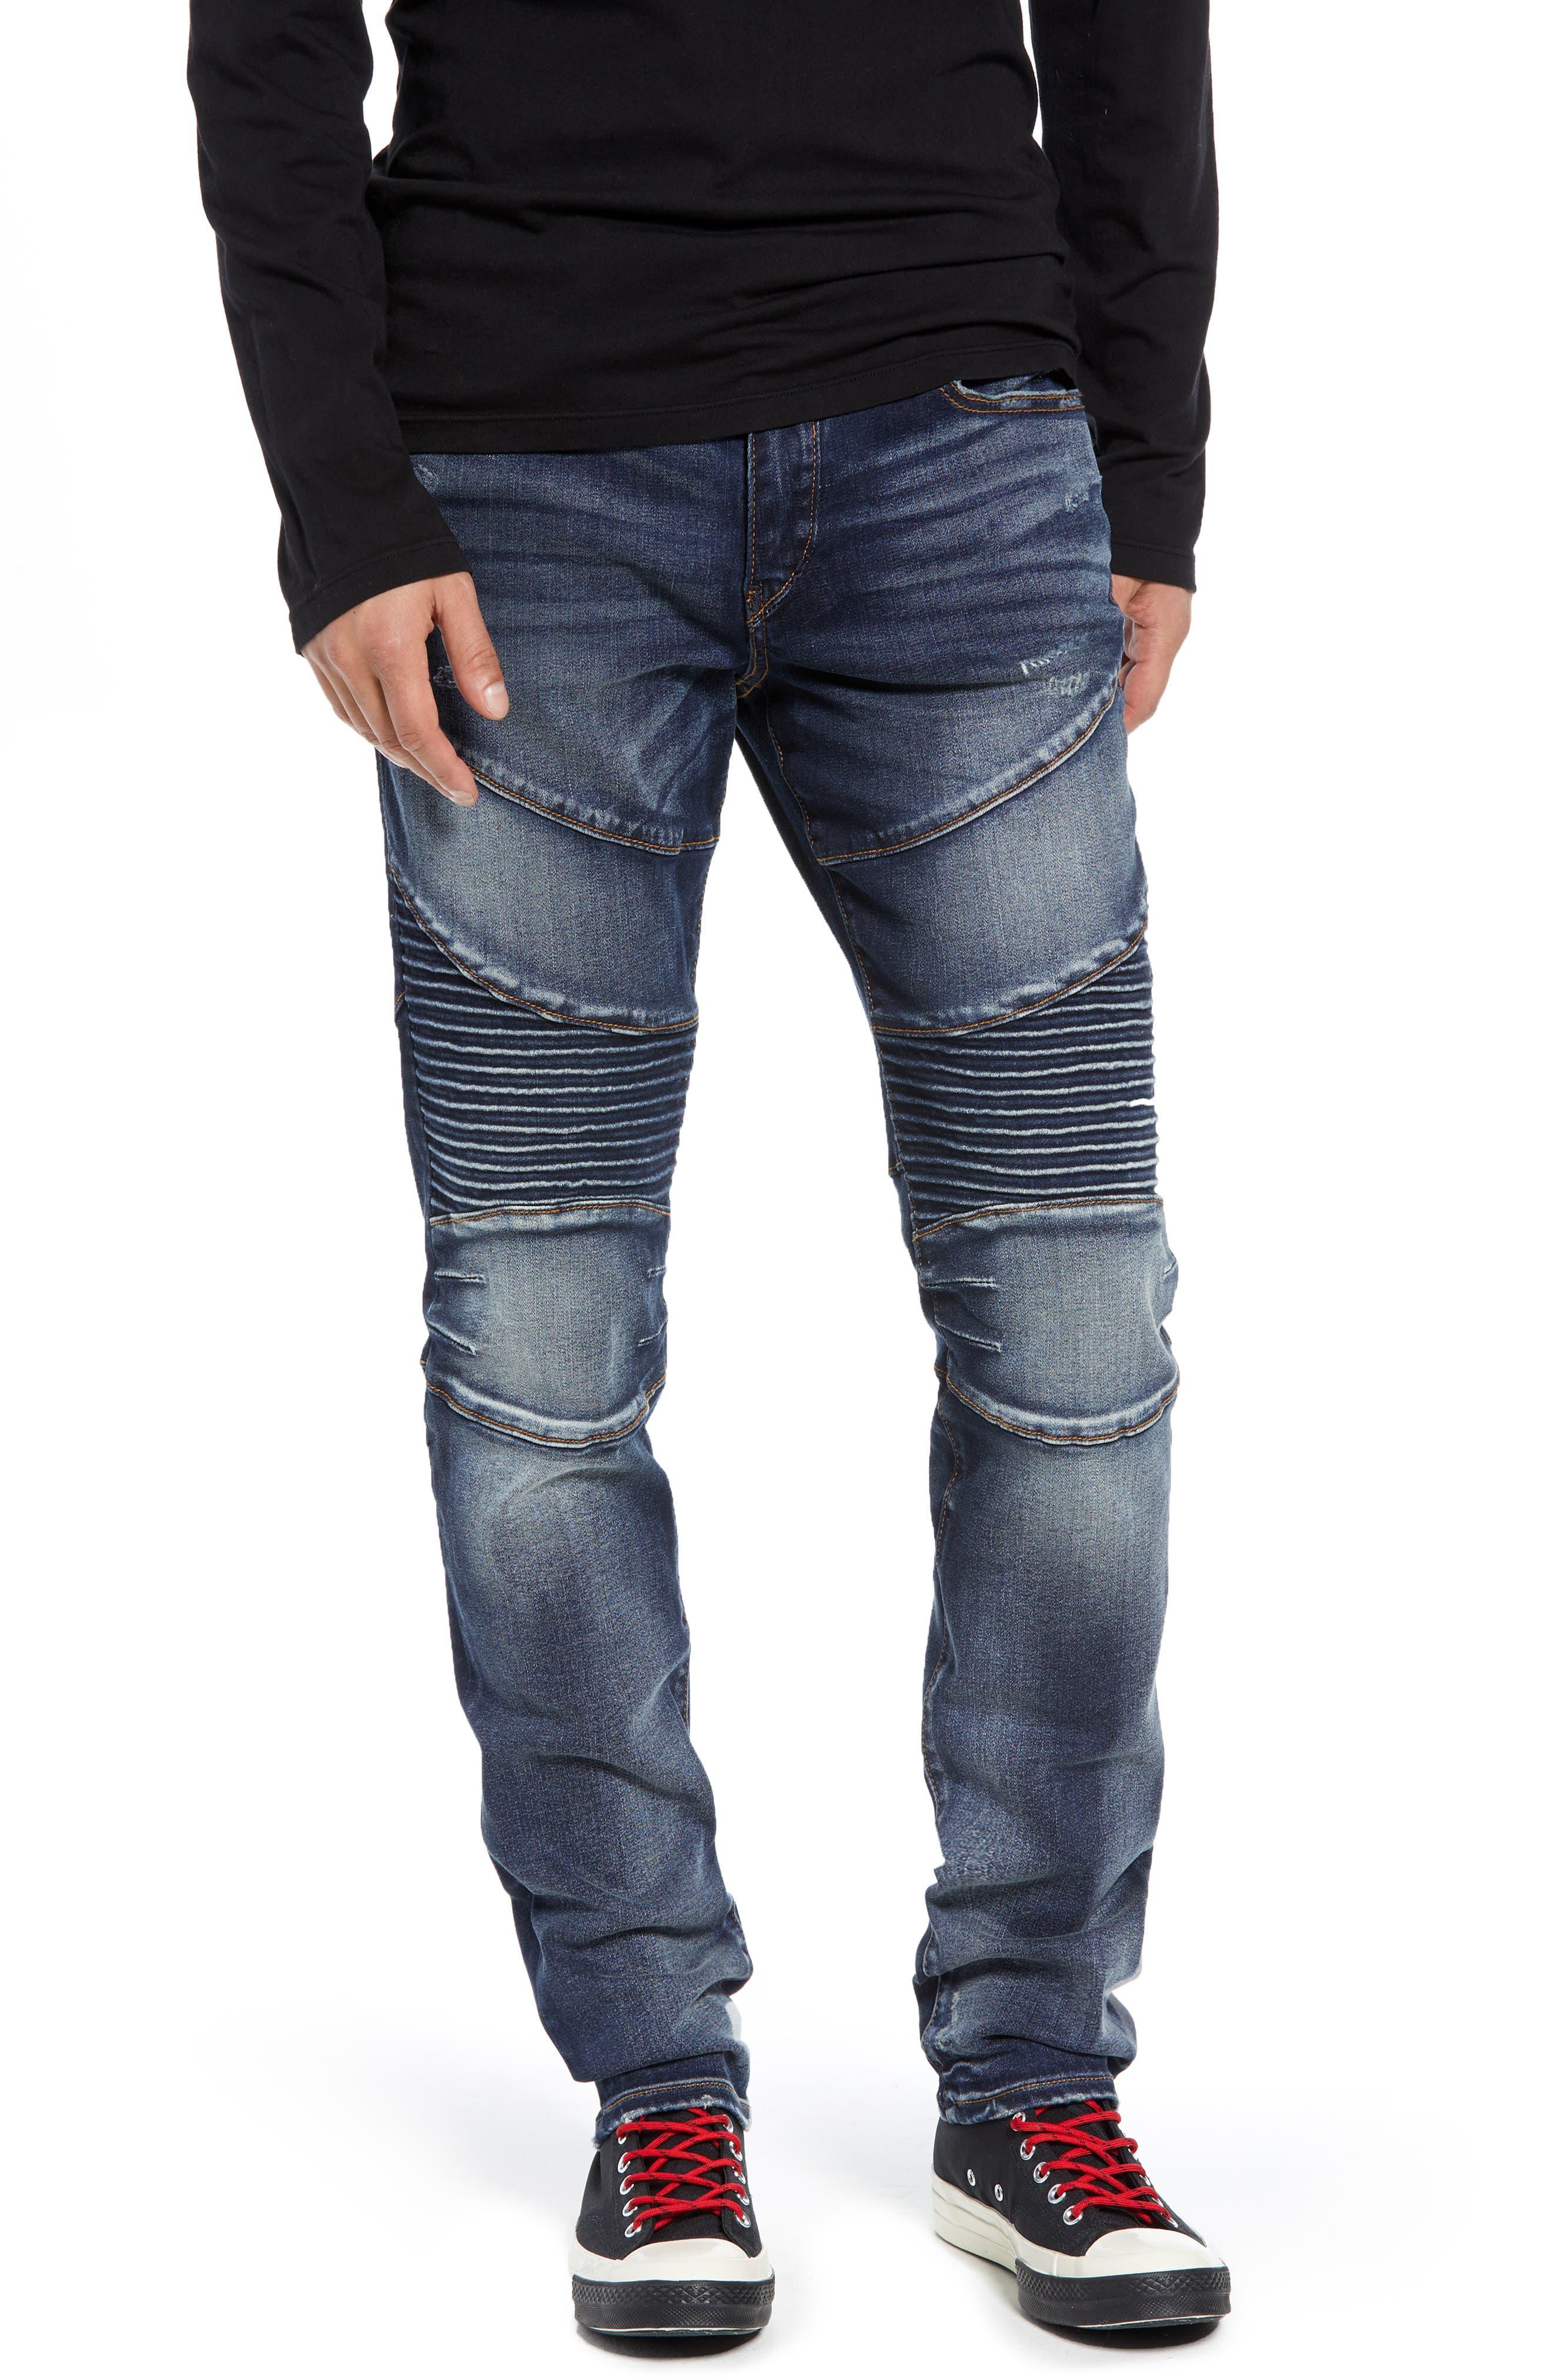 Rocco Skinny Fit Moto Jeans,                             Main thumbnail 1, color,                             MINERAL ASPHALT